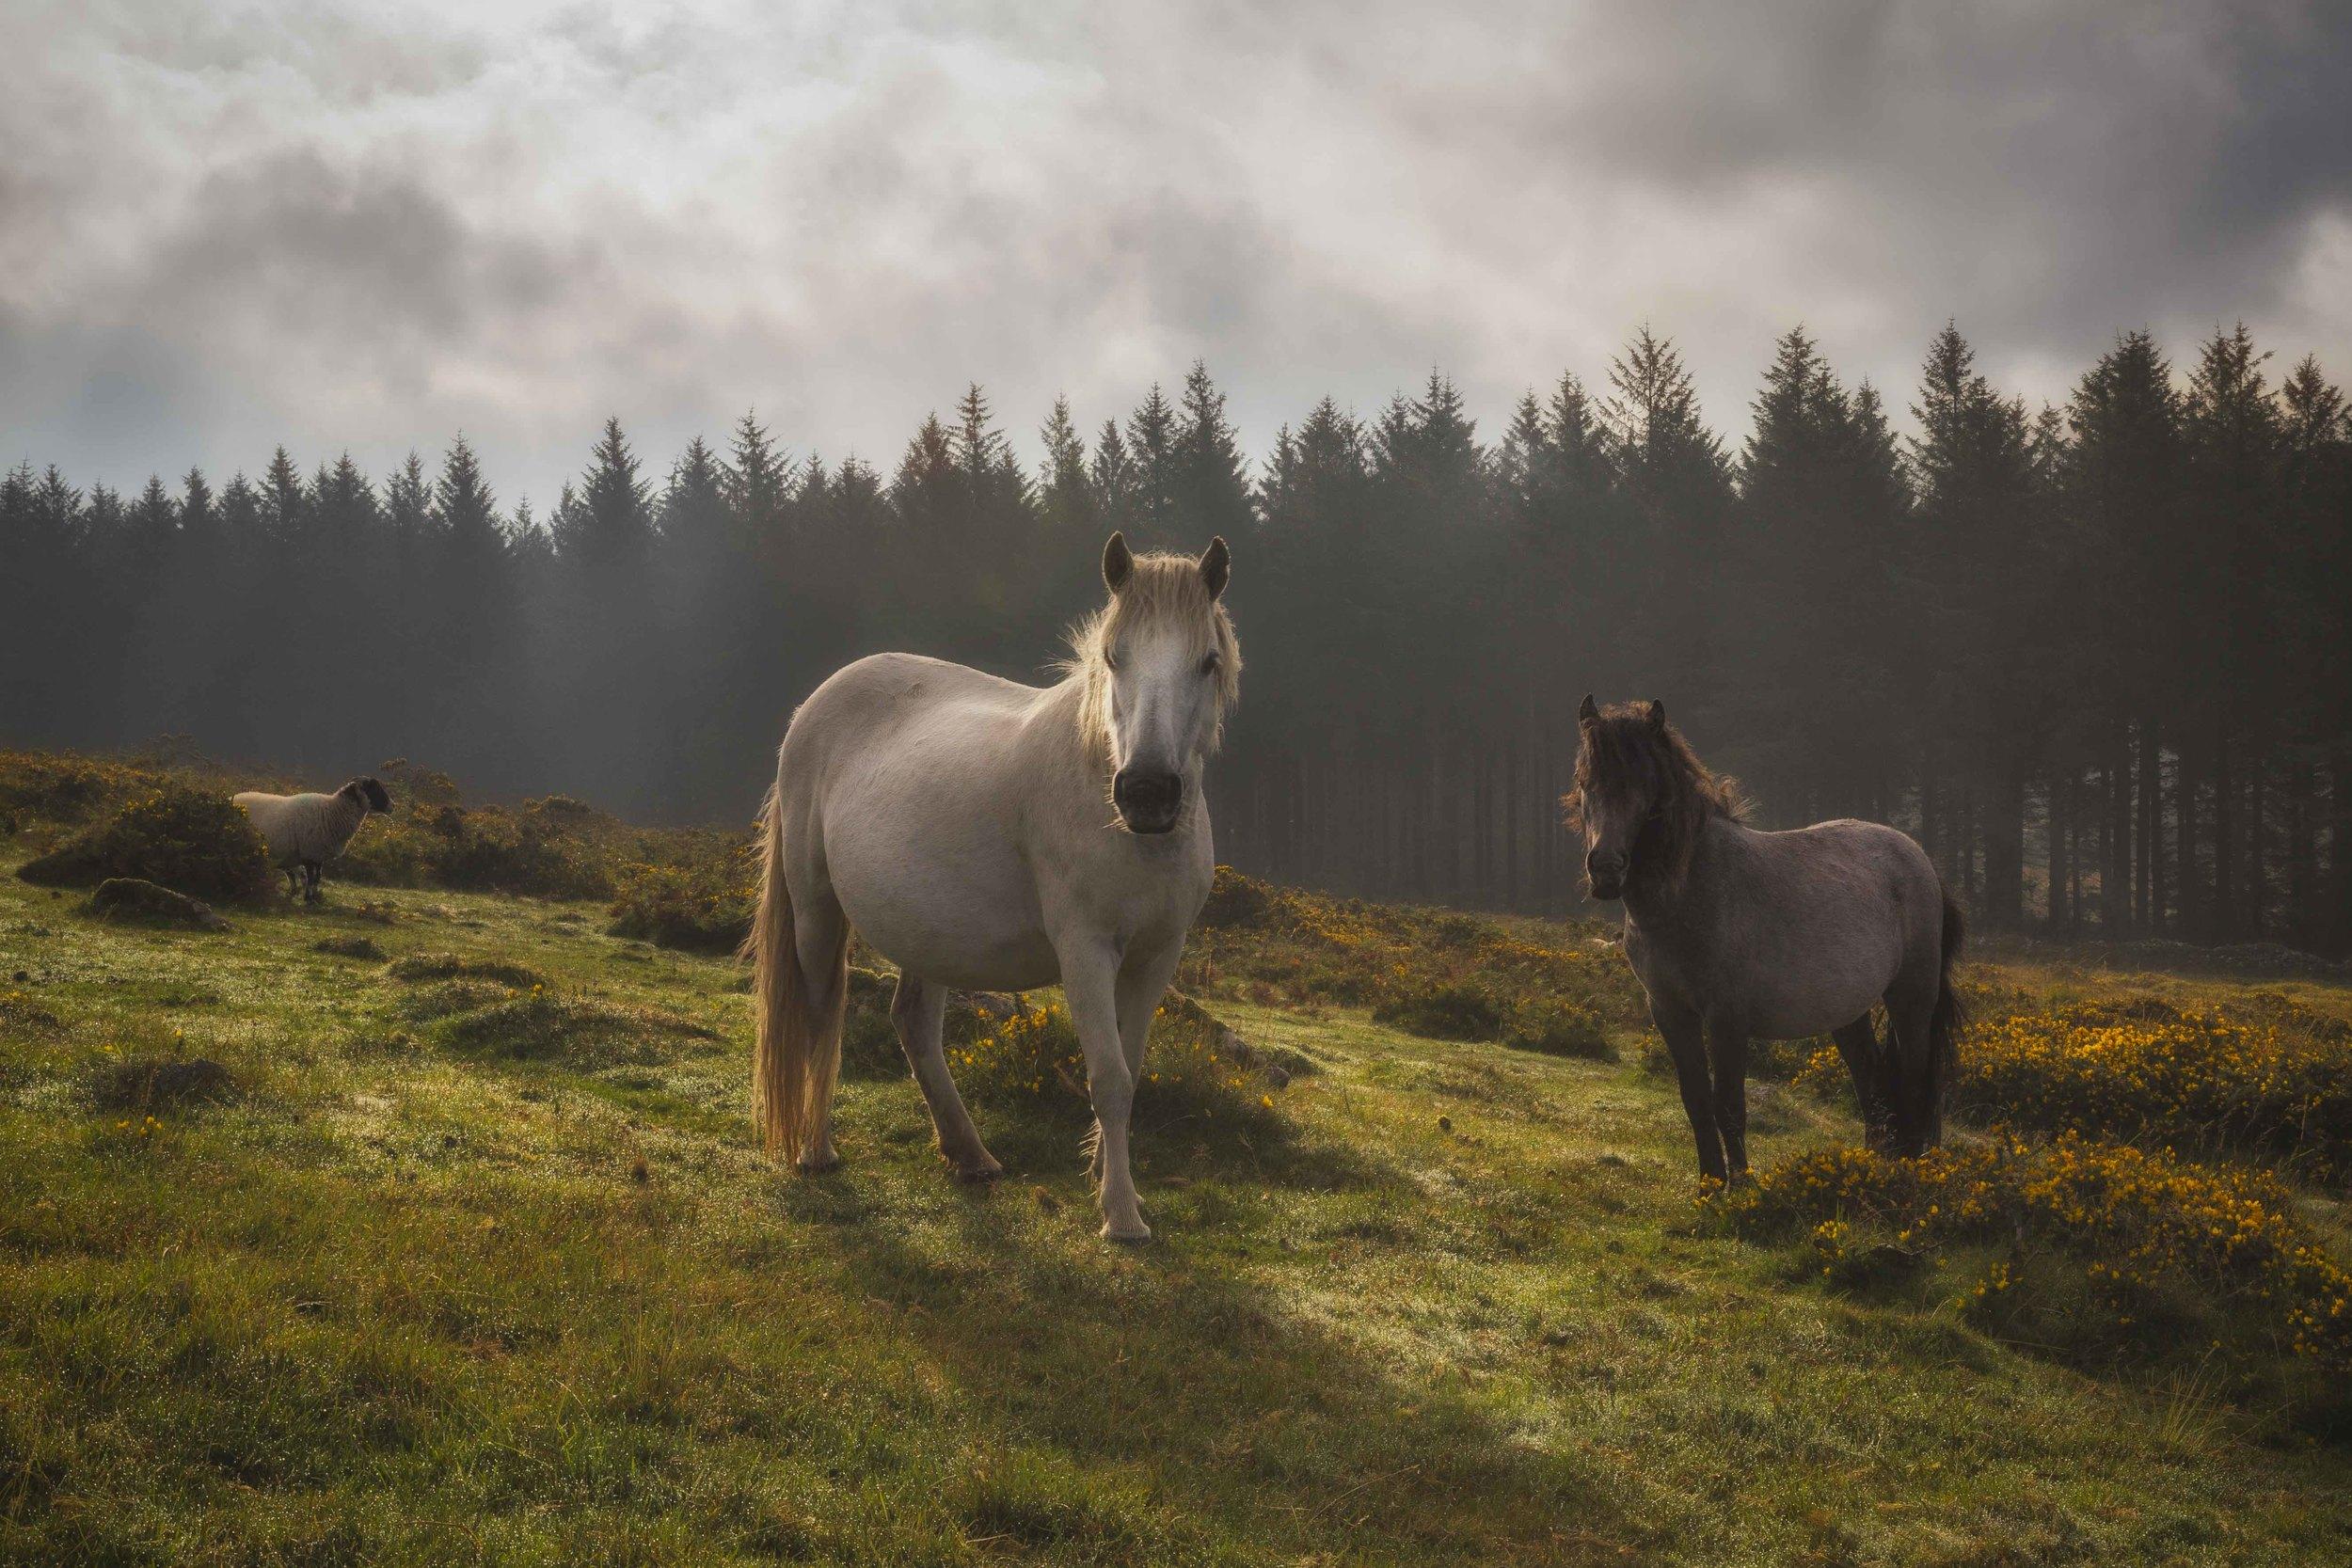 """The Watchers"" - Dartmoor, Devon, England. Canon 5D MK III + 24-70mm f/2.8 @ f/22. 1/80."